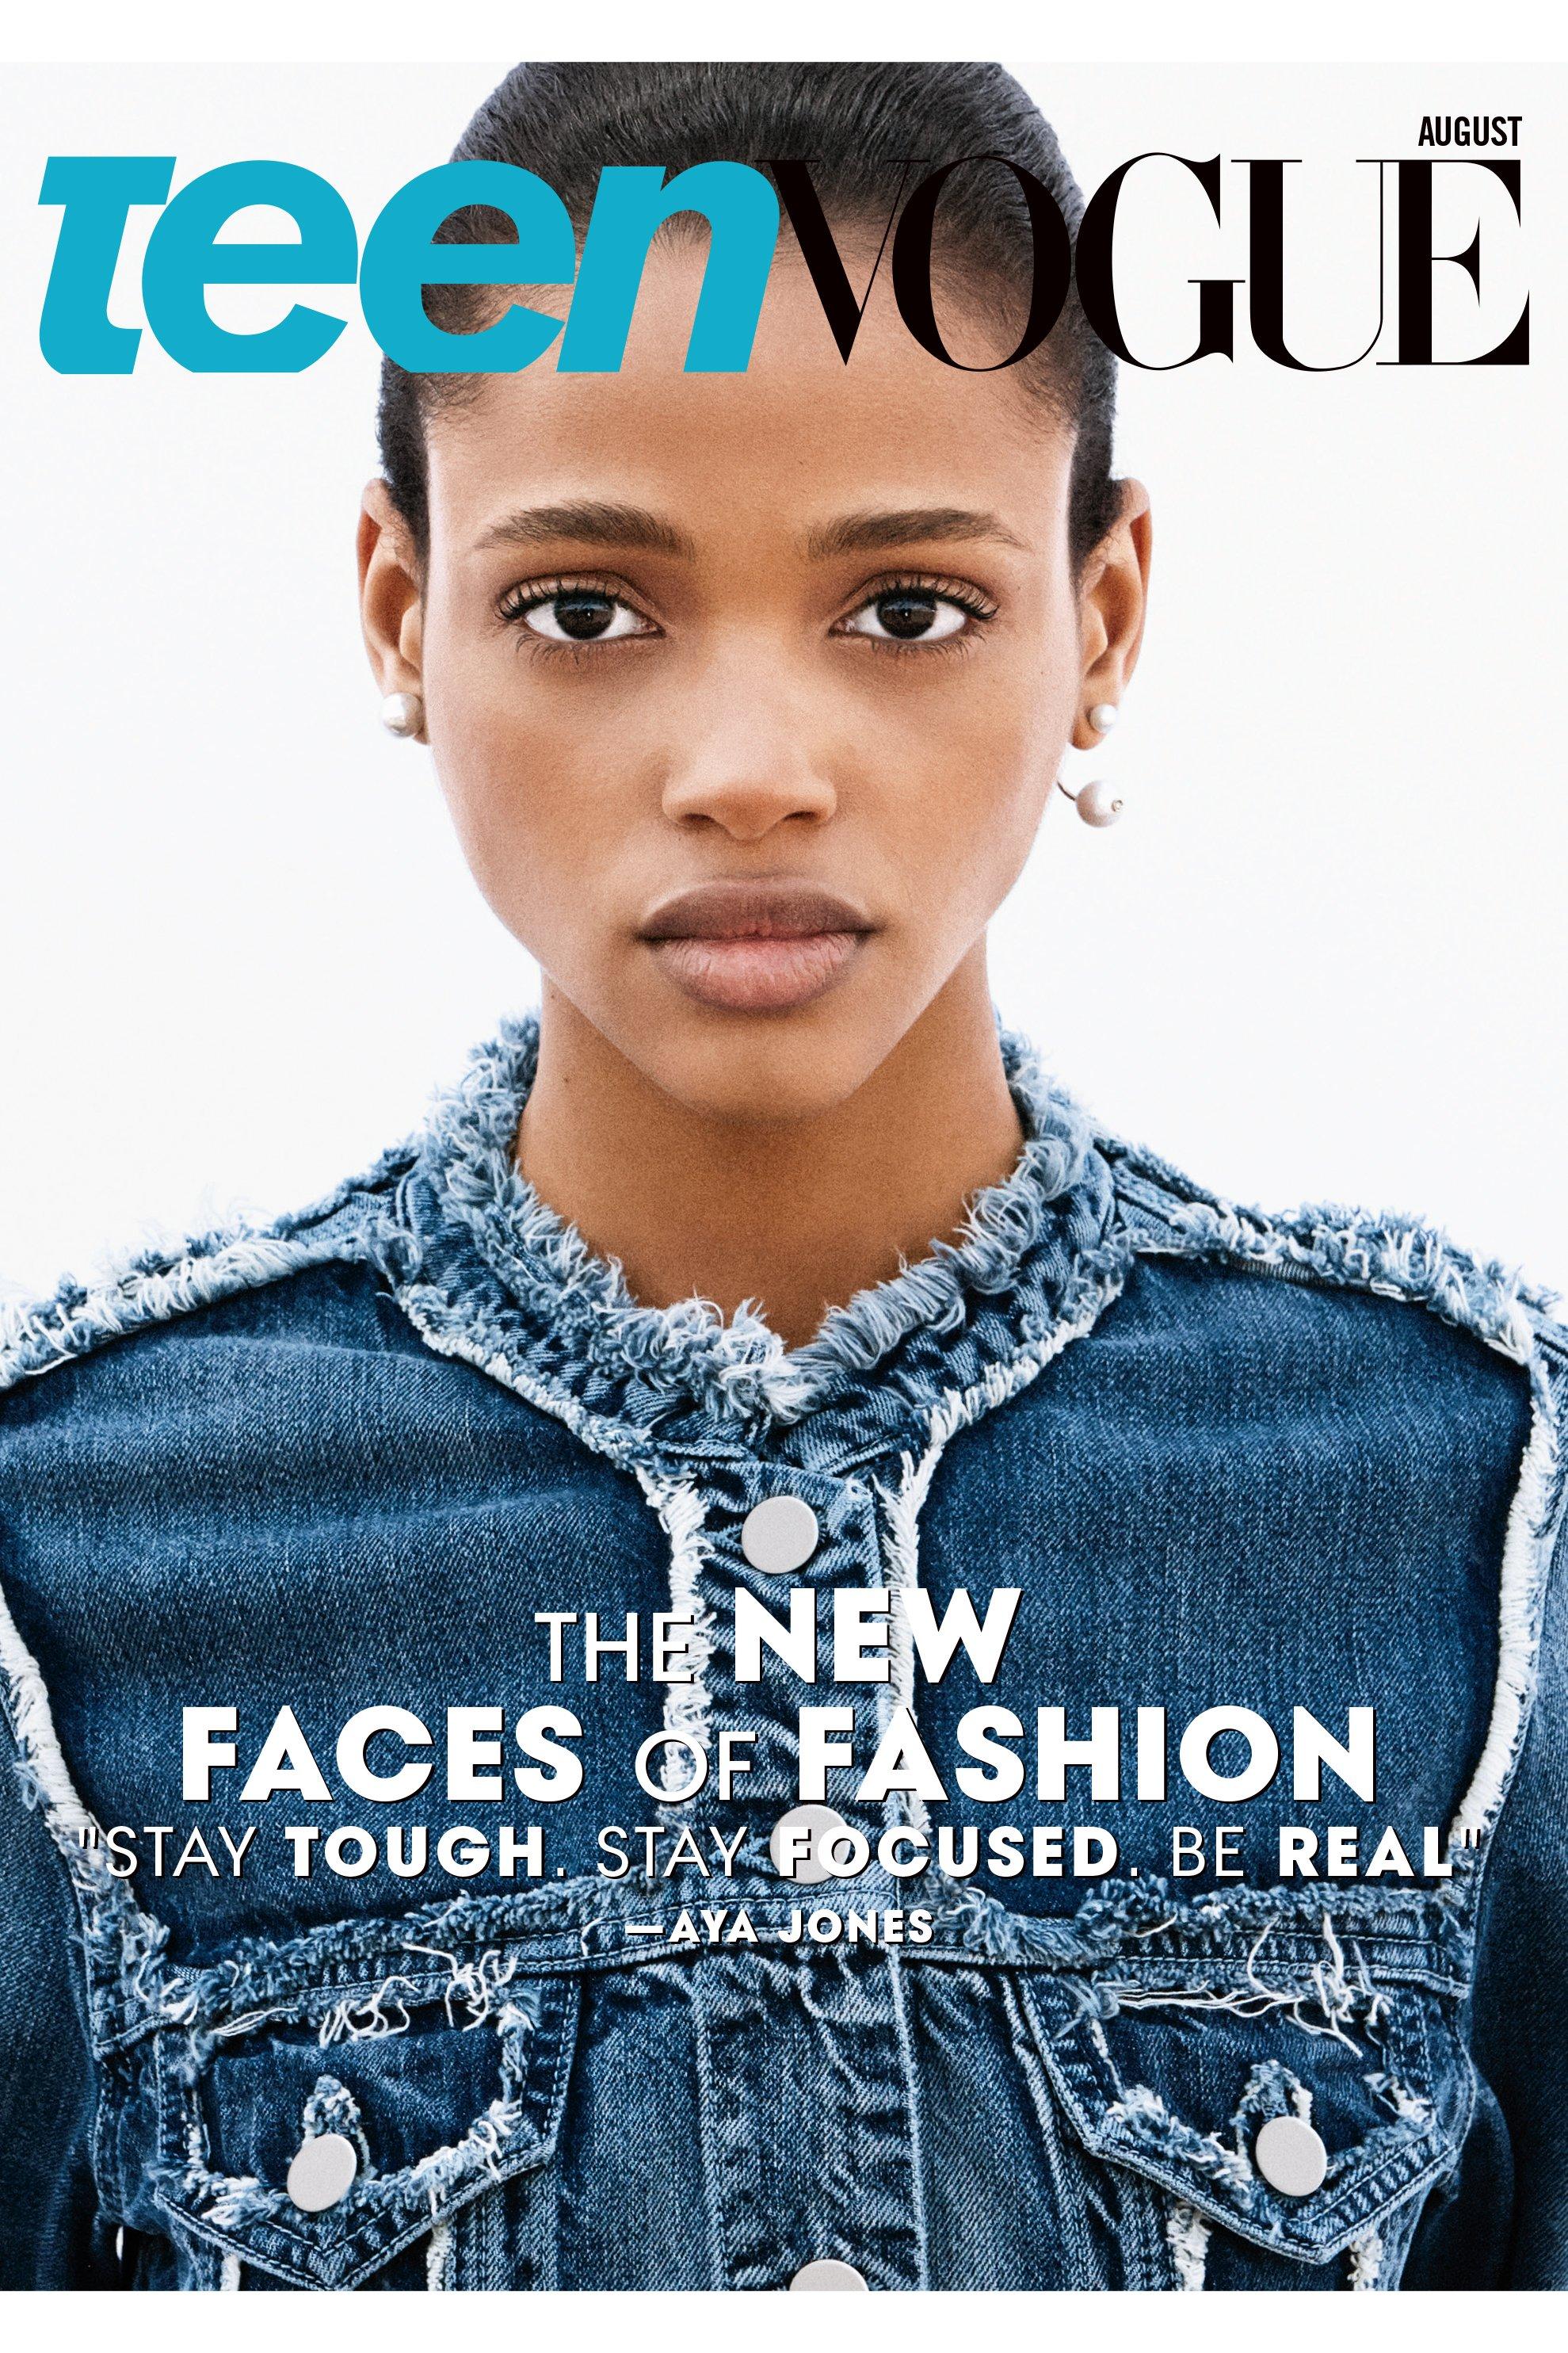 TeenCelebBuzz: Taylor Swift Covers Teen Vogue August 2011